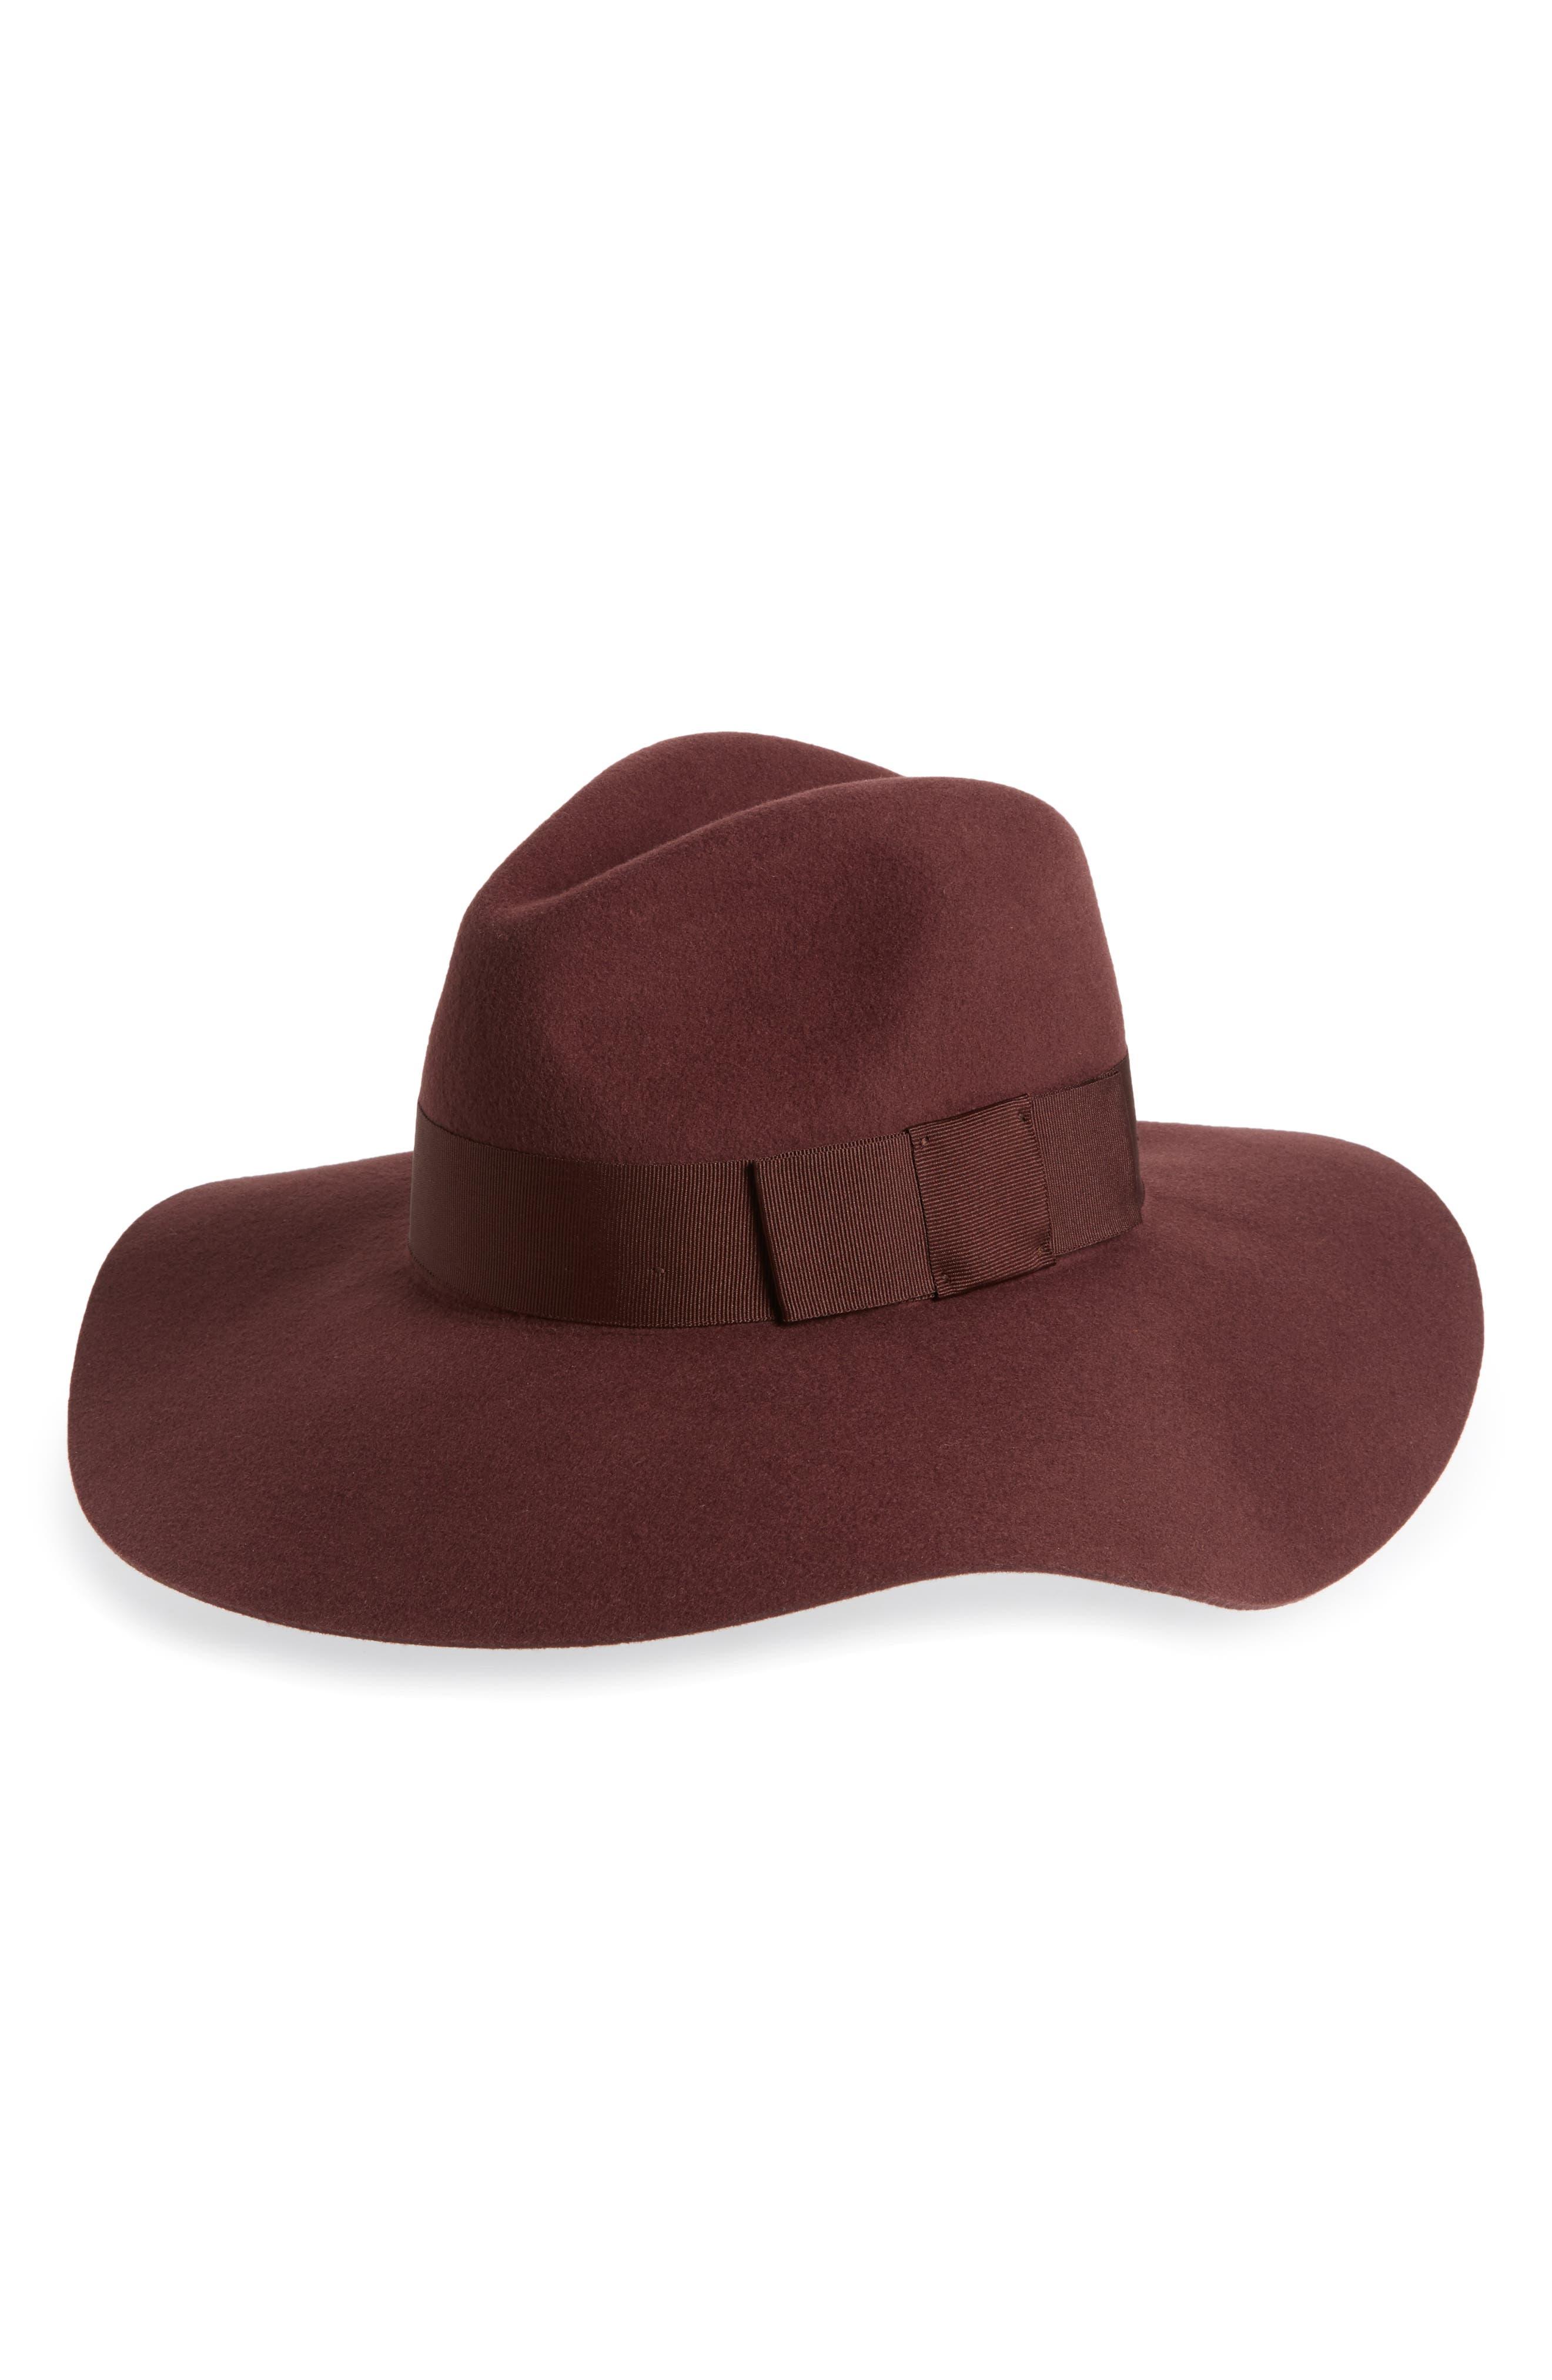 Brixton Piper Floppy Wool Felt Hat